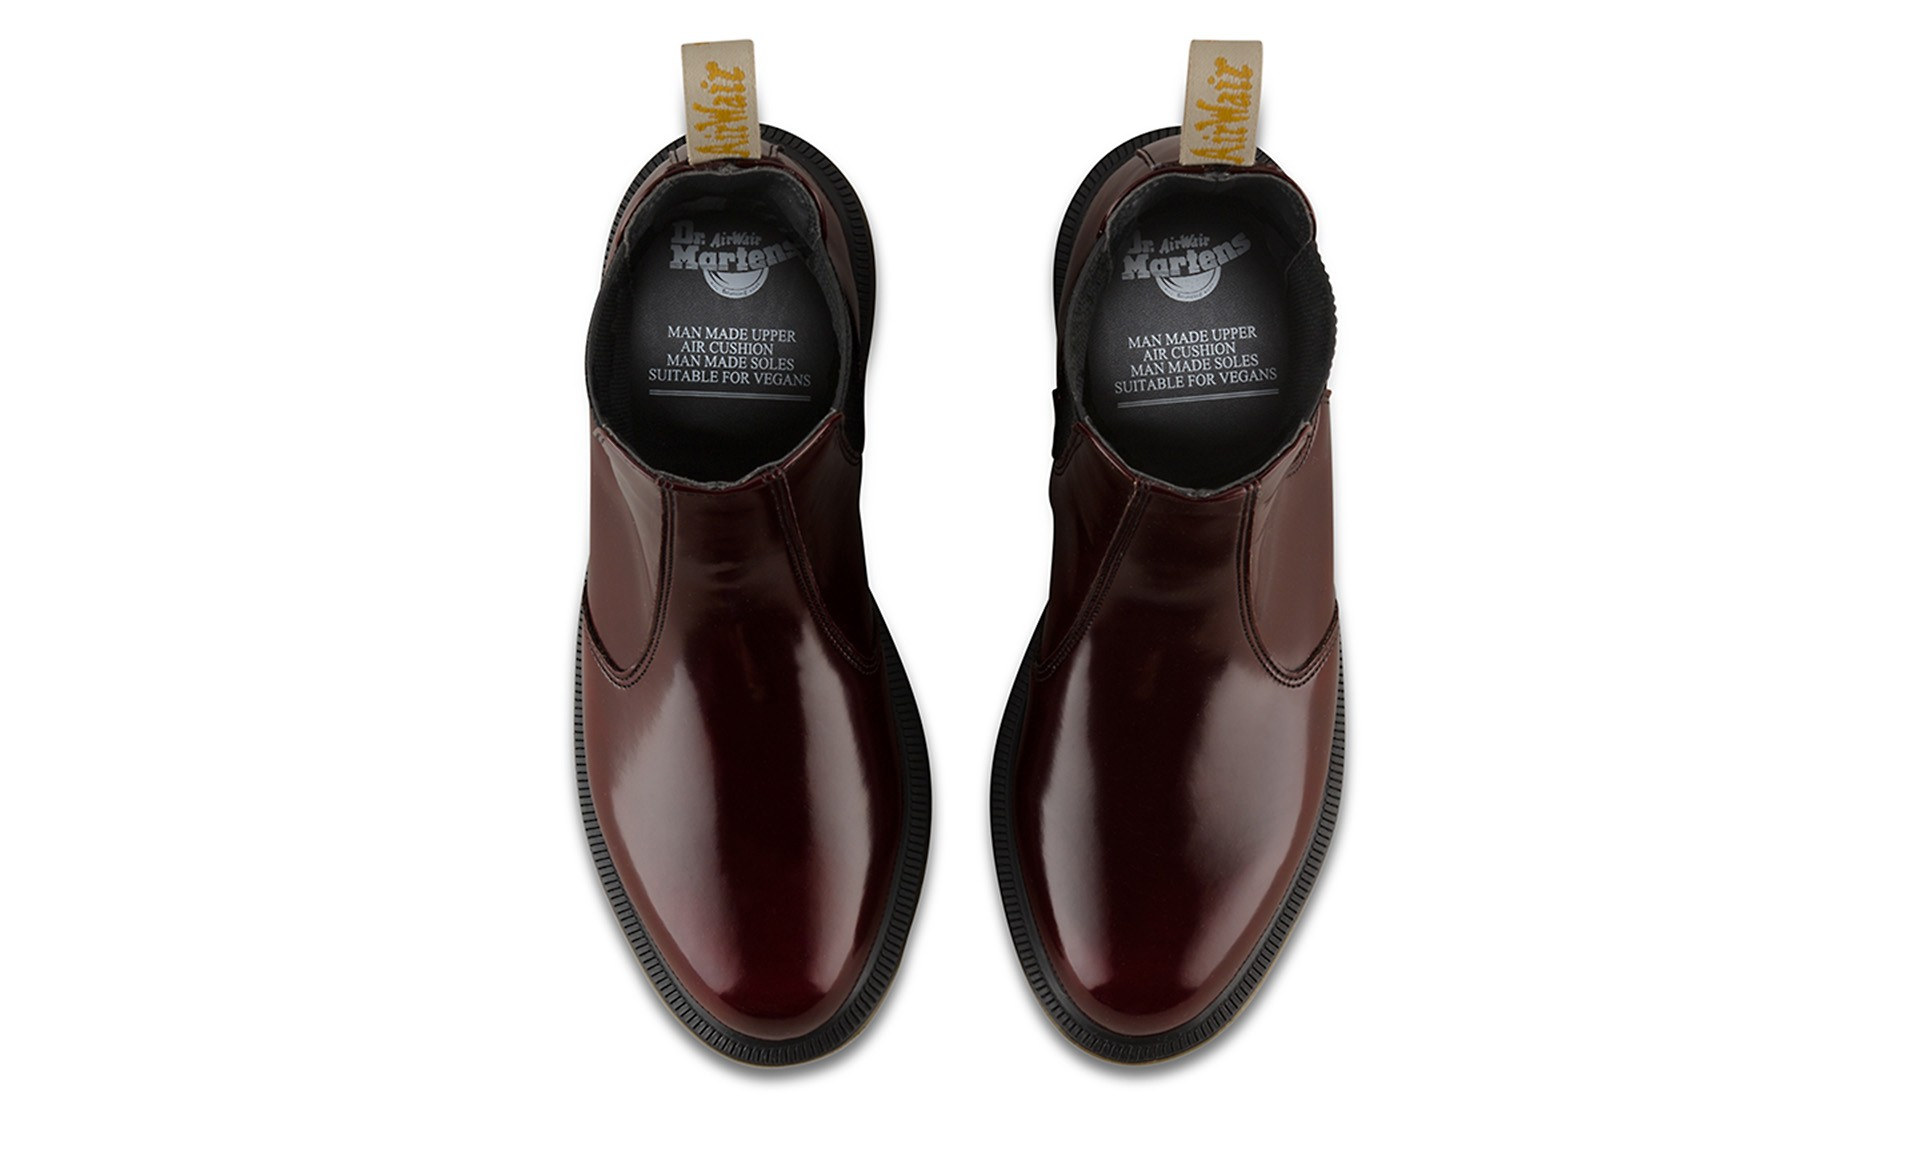 f195c179c40 Vegan Chelsea Boot | DR. MARTENS Flora Chelsea Boot Cherry Red ...